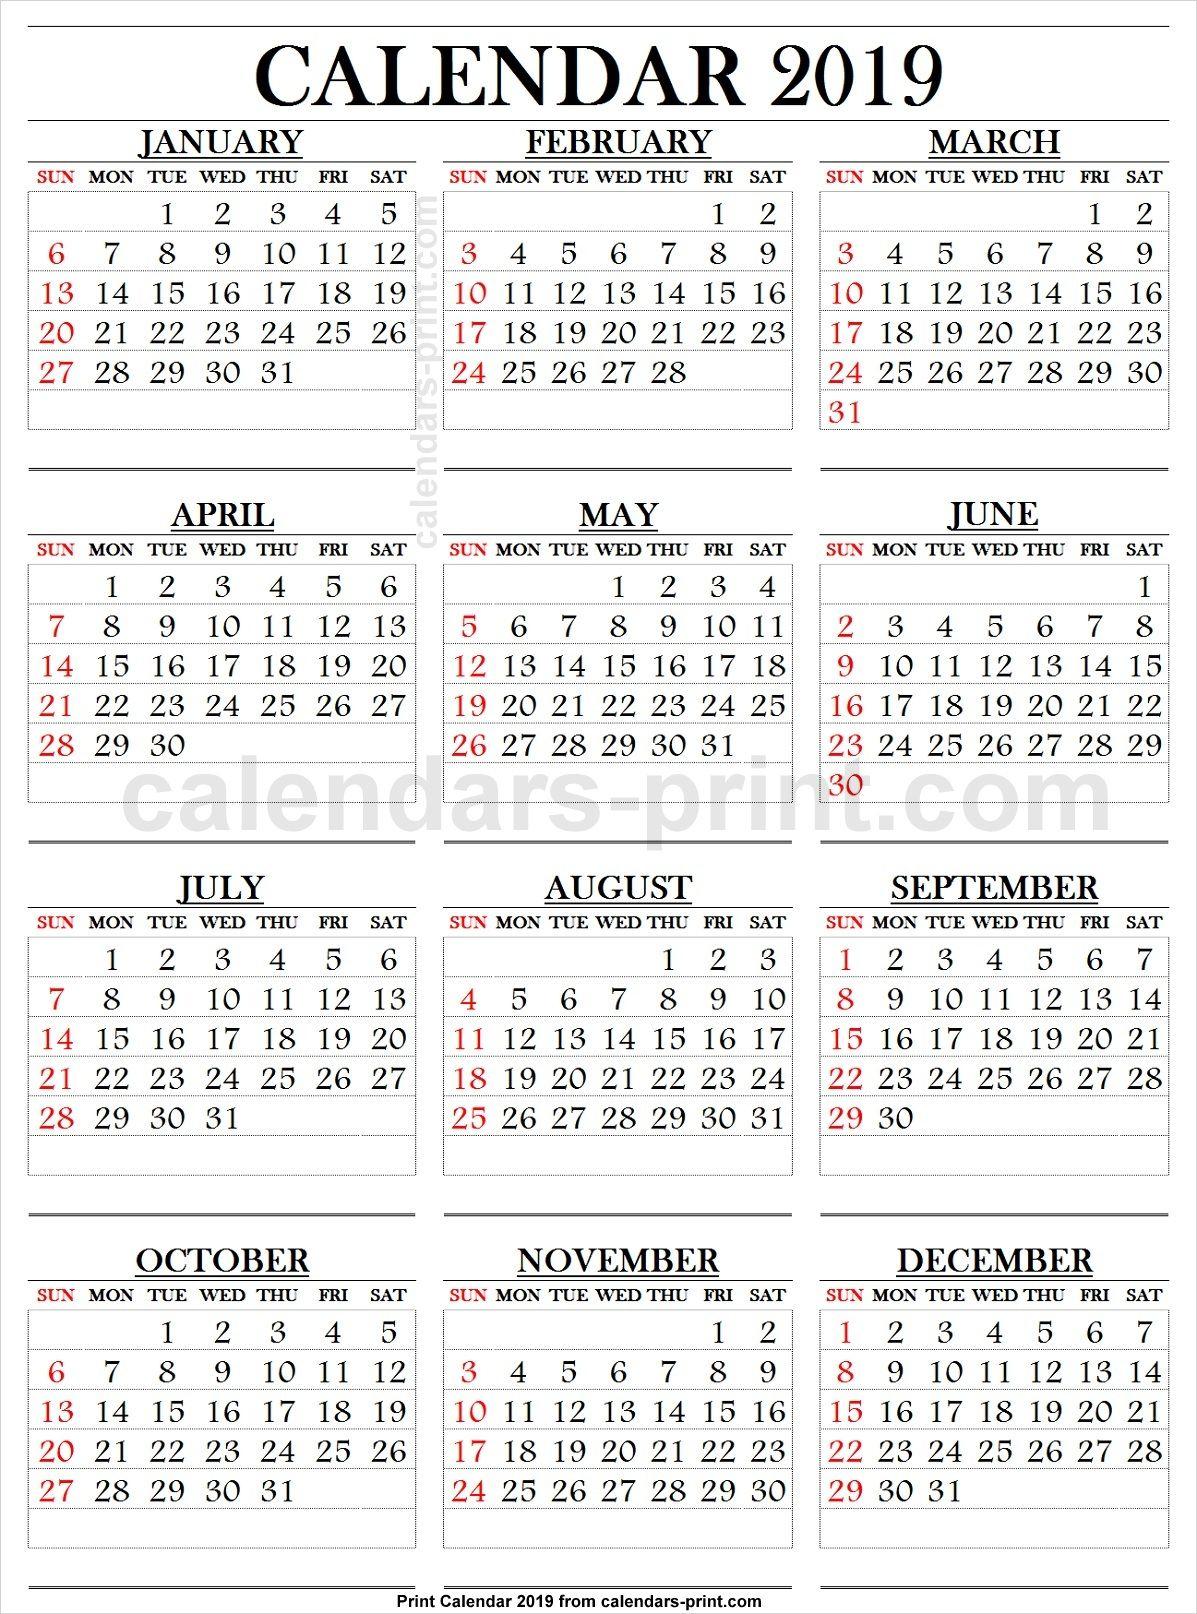 2019 Calendar Large Numbers | Printable Calendar Large intended for Large Number Calendar